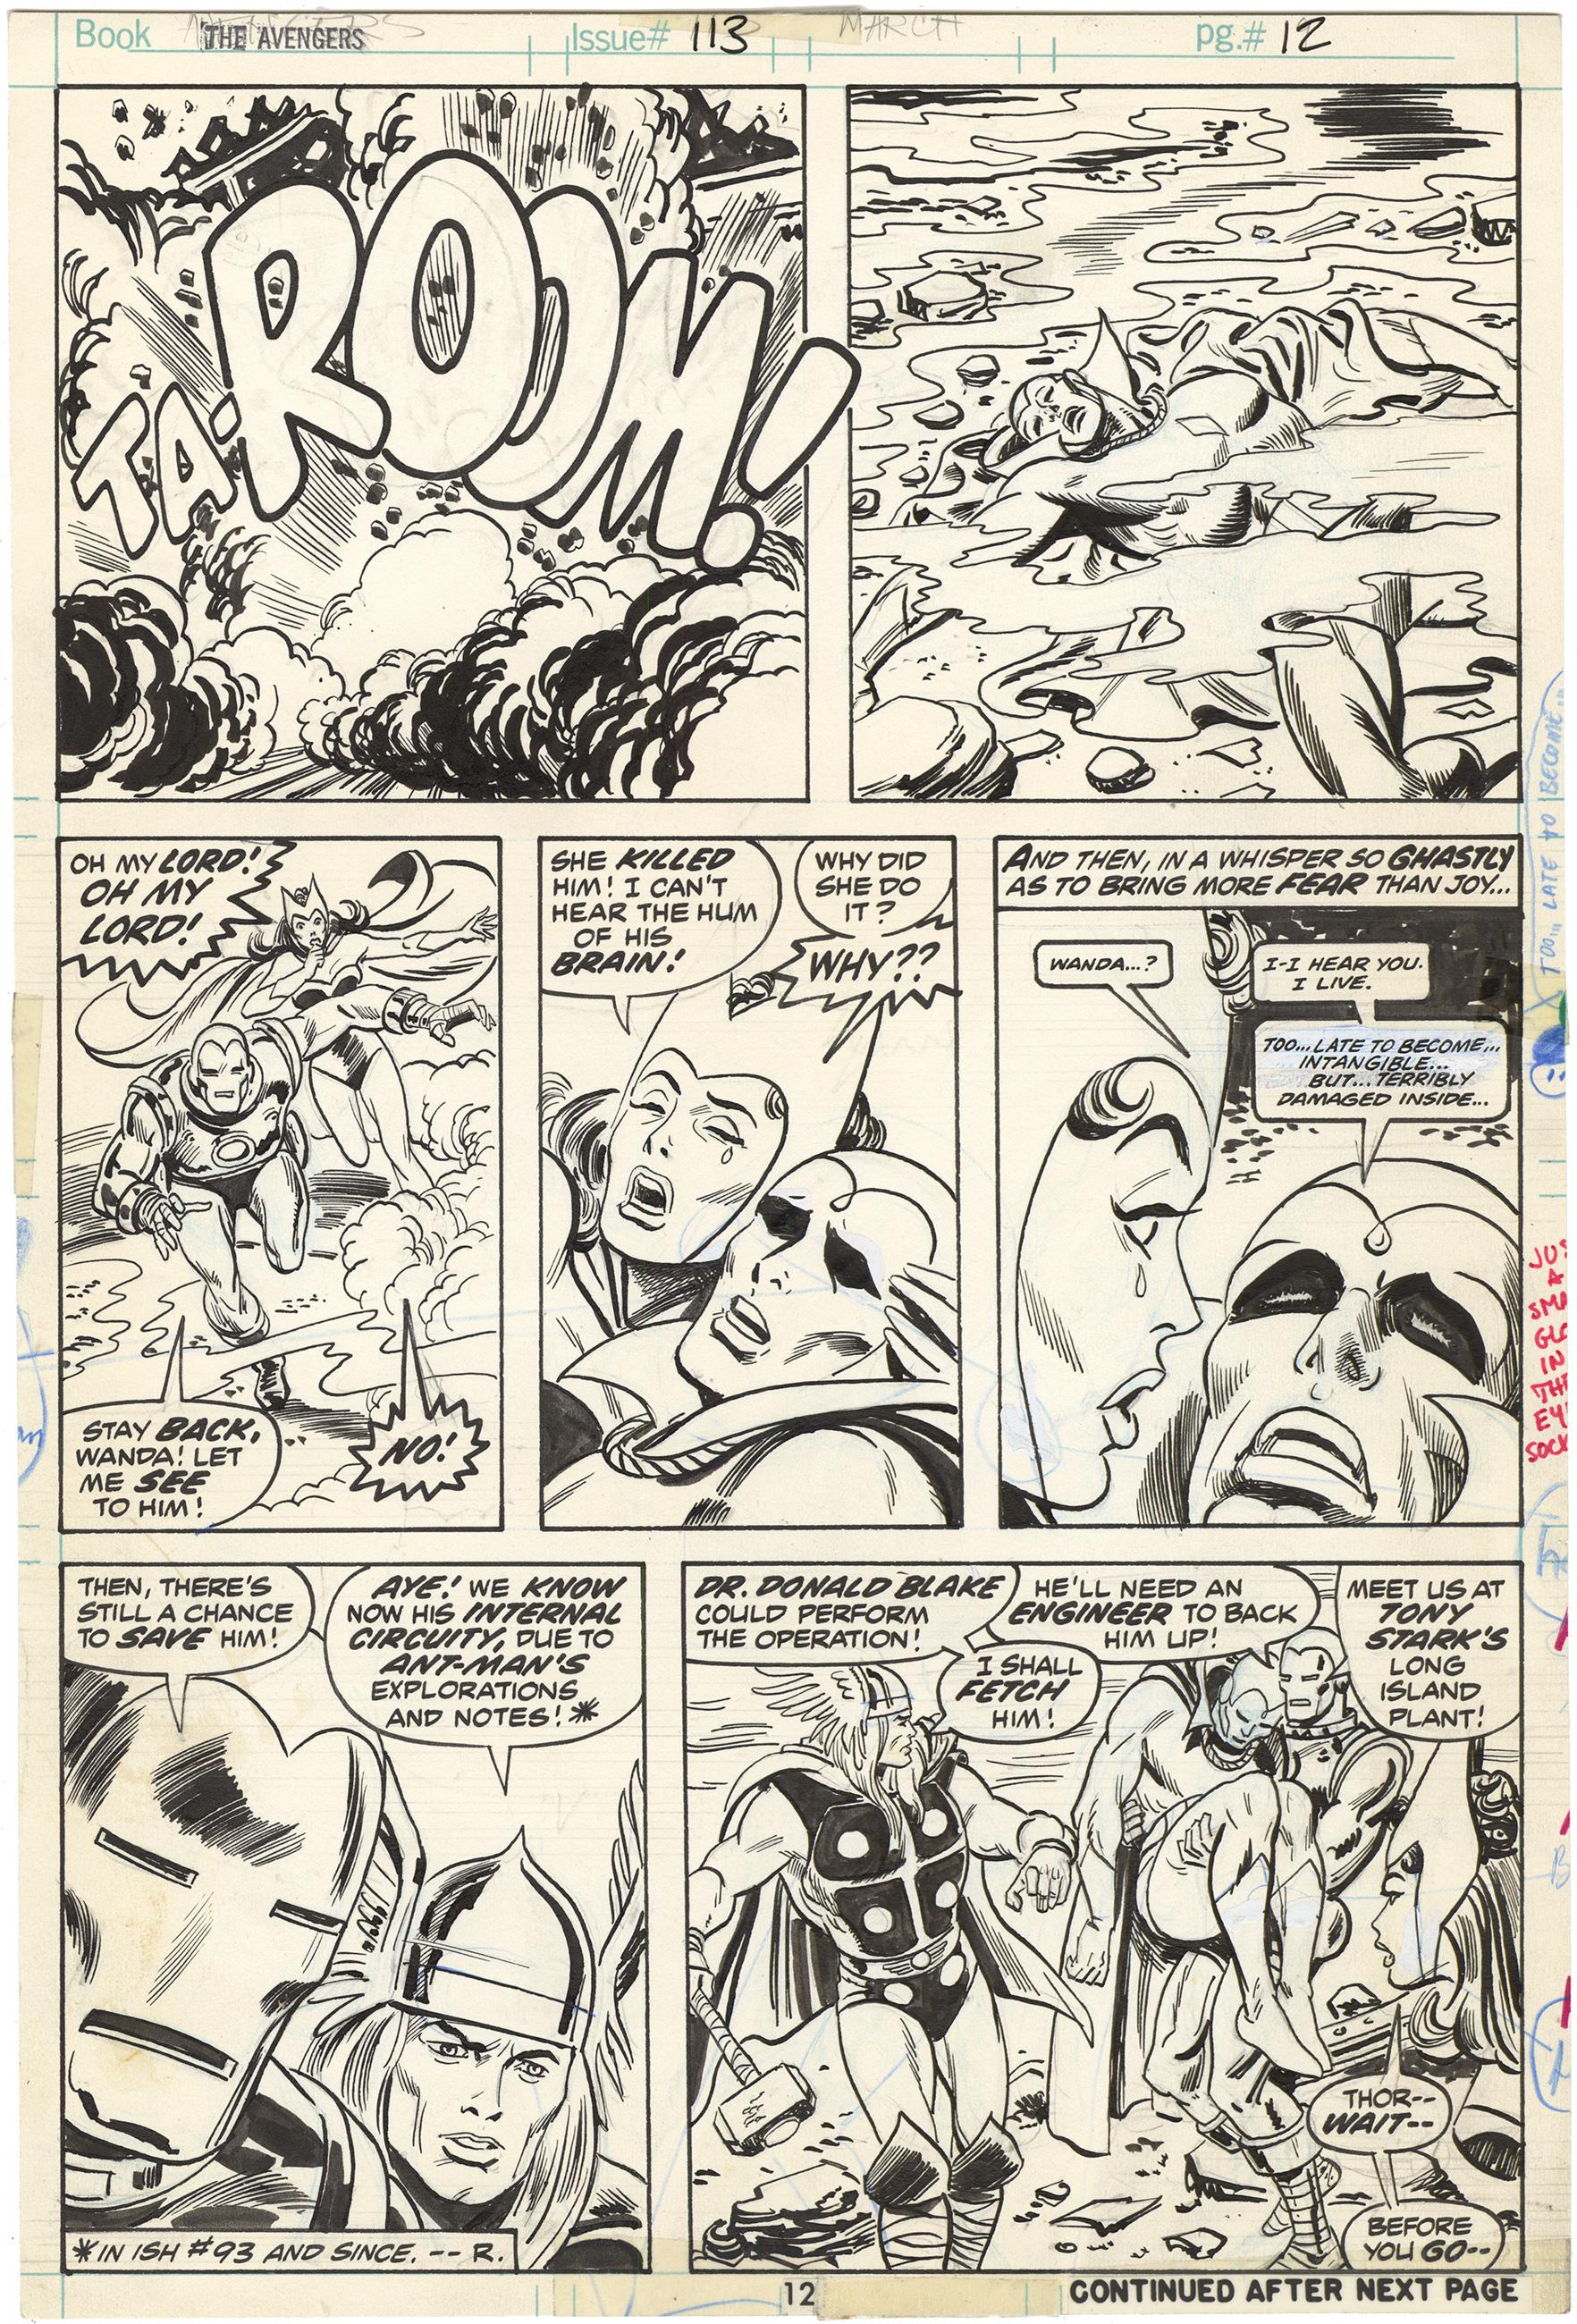 Avengers #113 p12